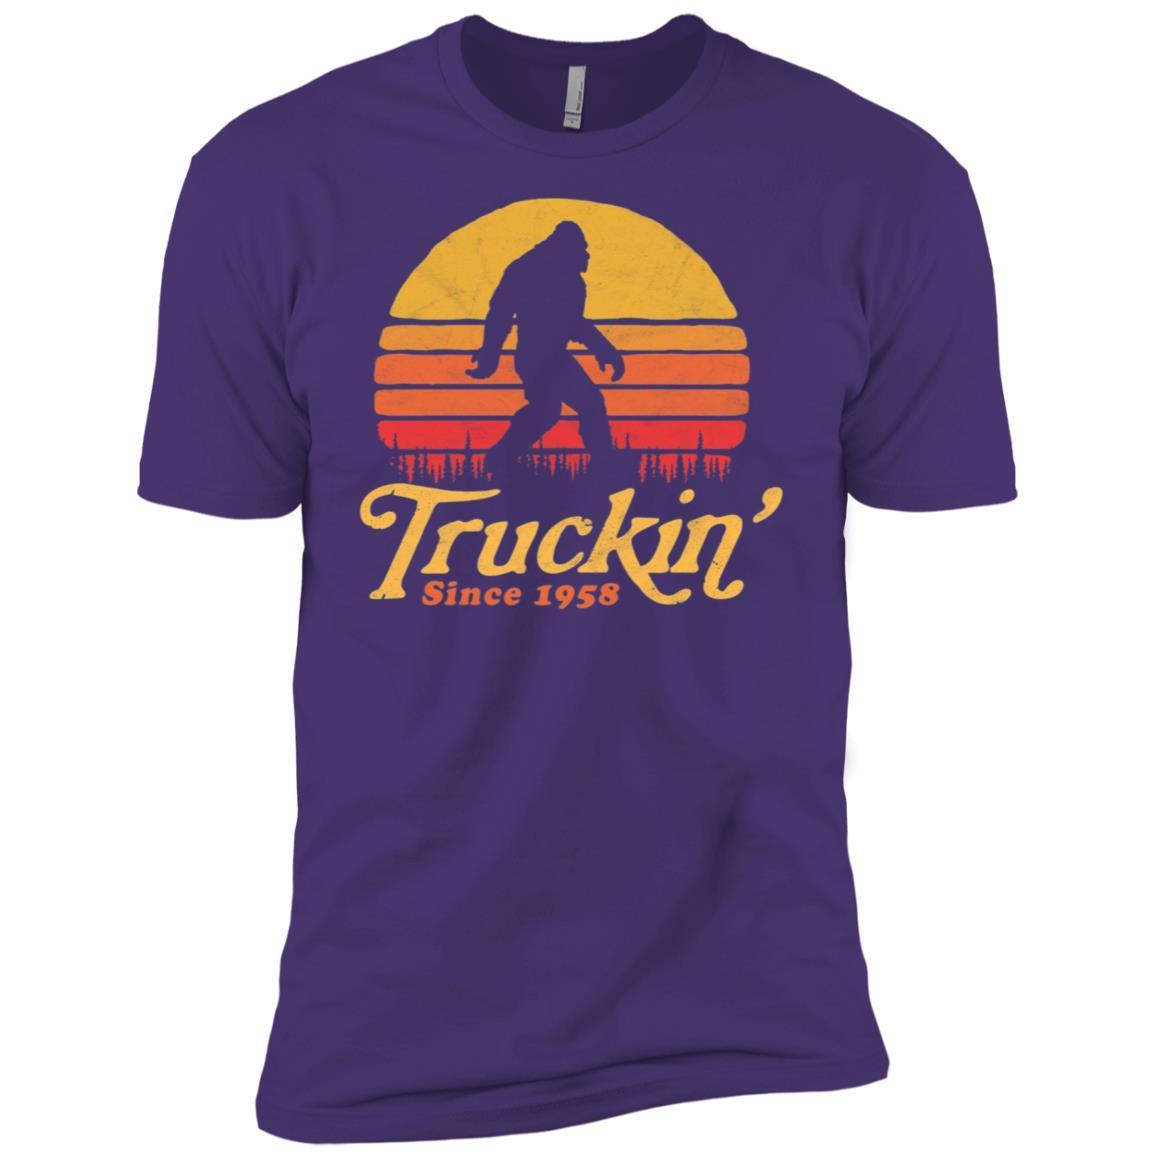 Truckin' Since 1958 Bigfoot 60th Birthday Men Short Sleeve T-Shirt